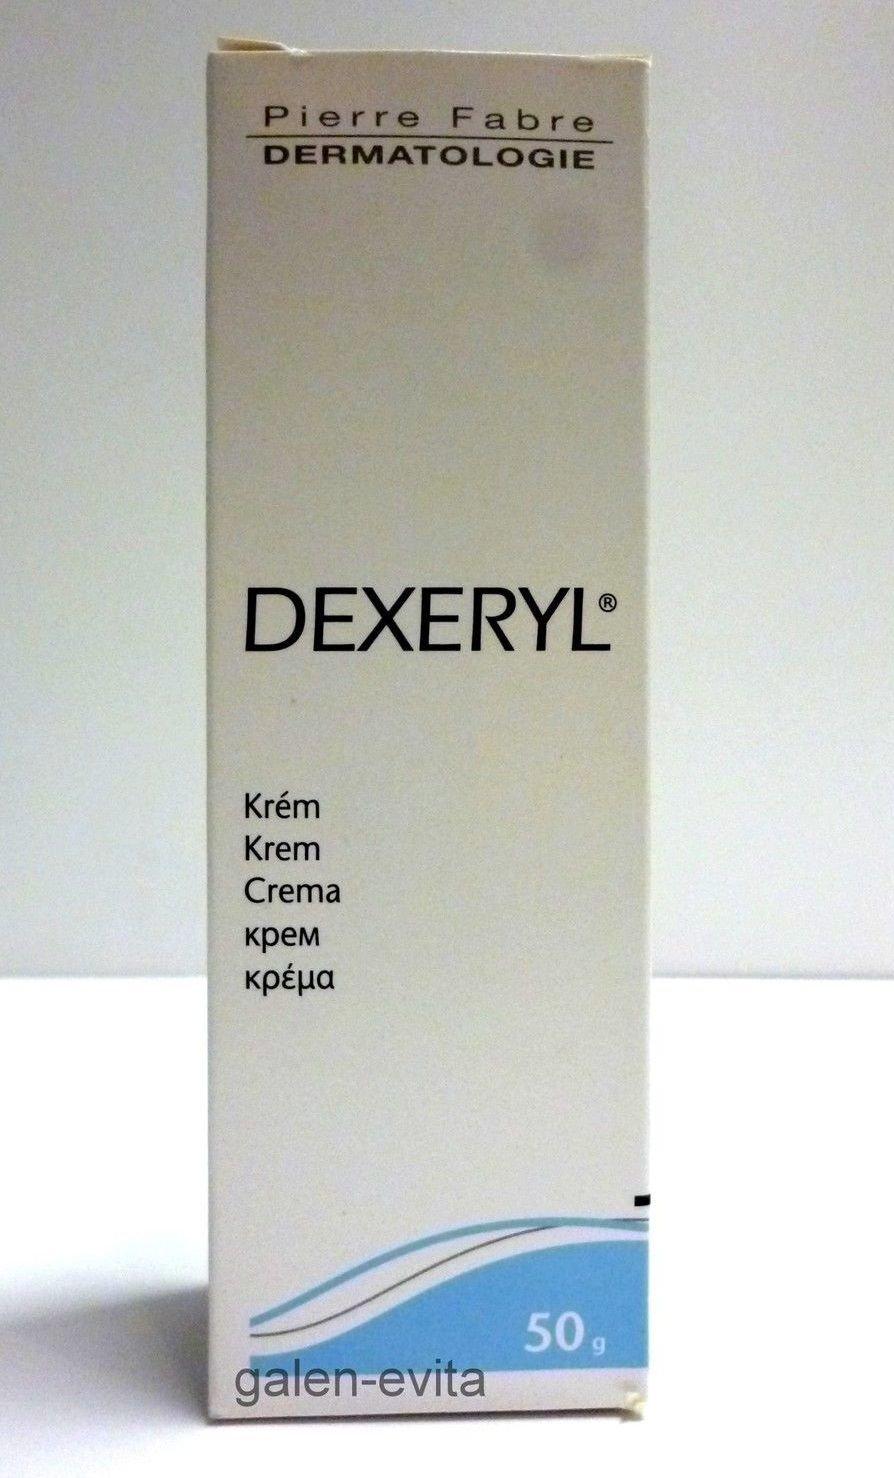 Dexeryl Dermatological Cream 50g - Atopic Dermatitis Treatment Beauty Skin